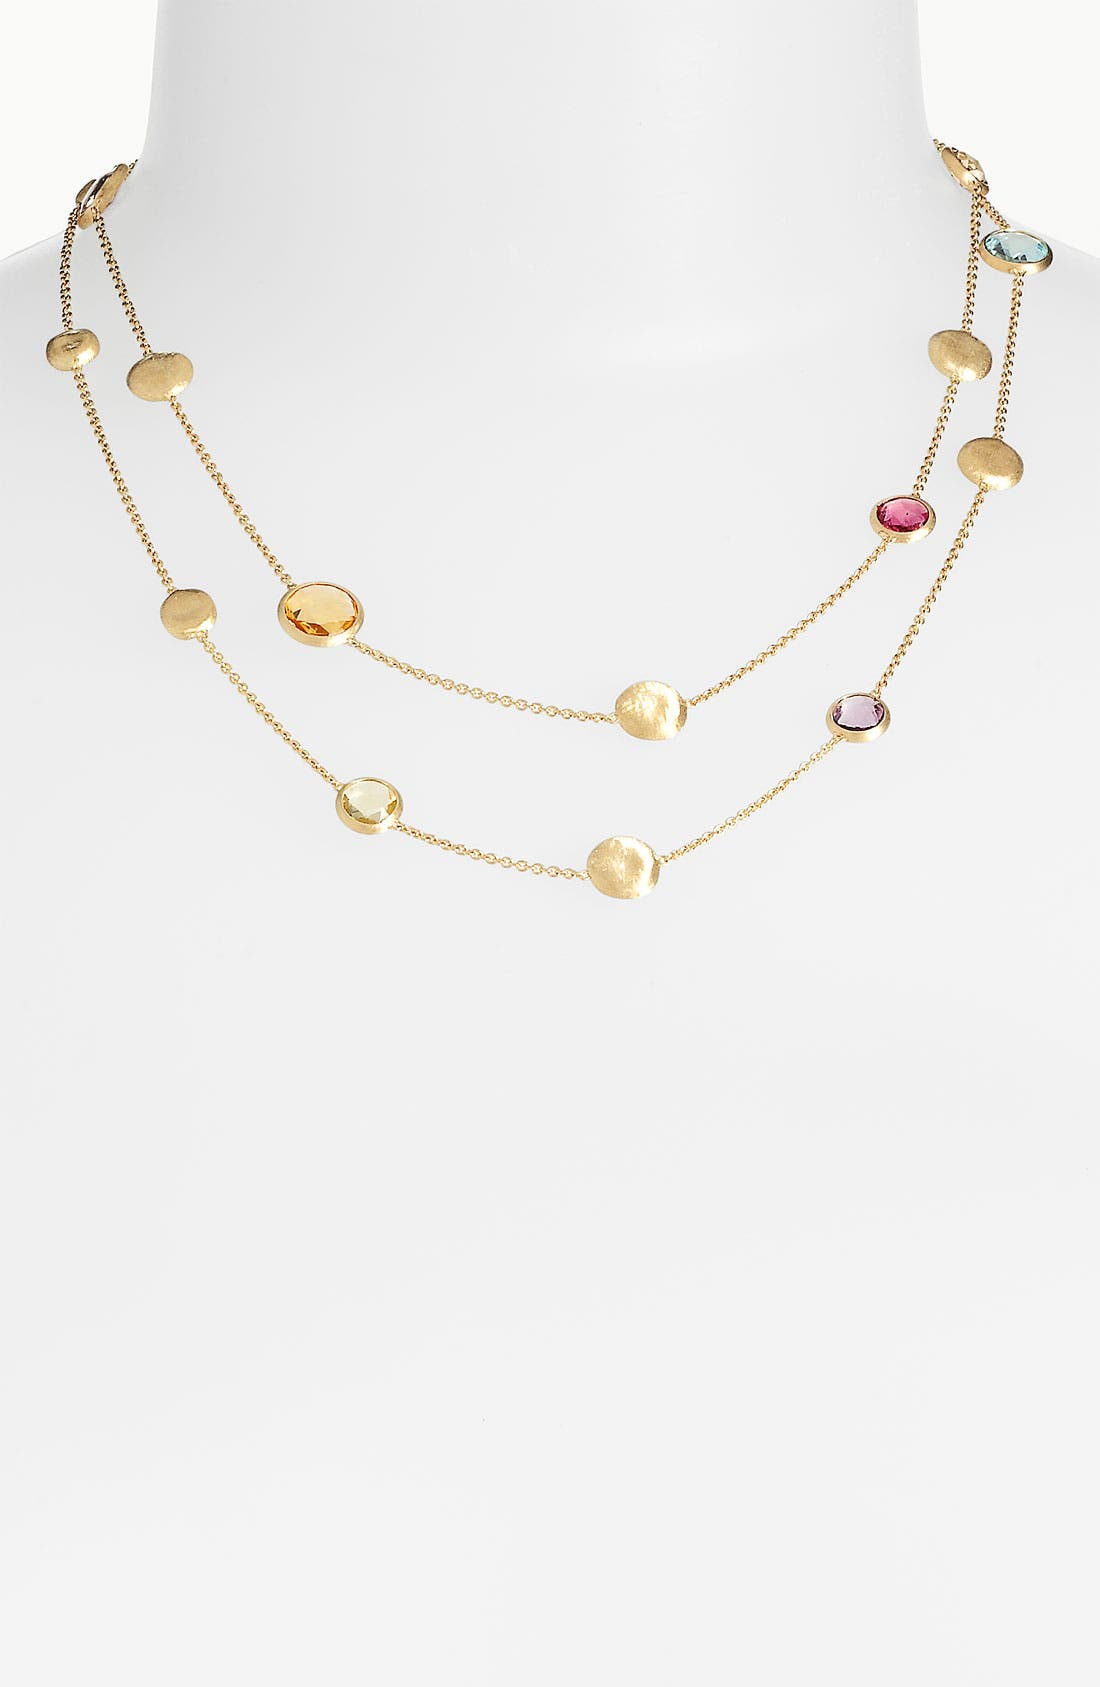 Main Image - Marco Bicego 'Jaipur' Semiprecious Stone Long Necklace